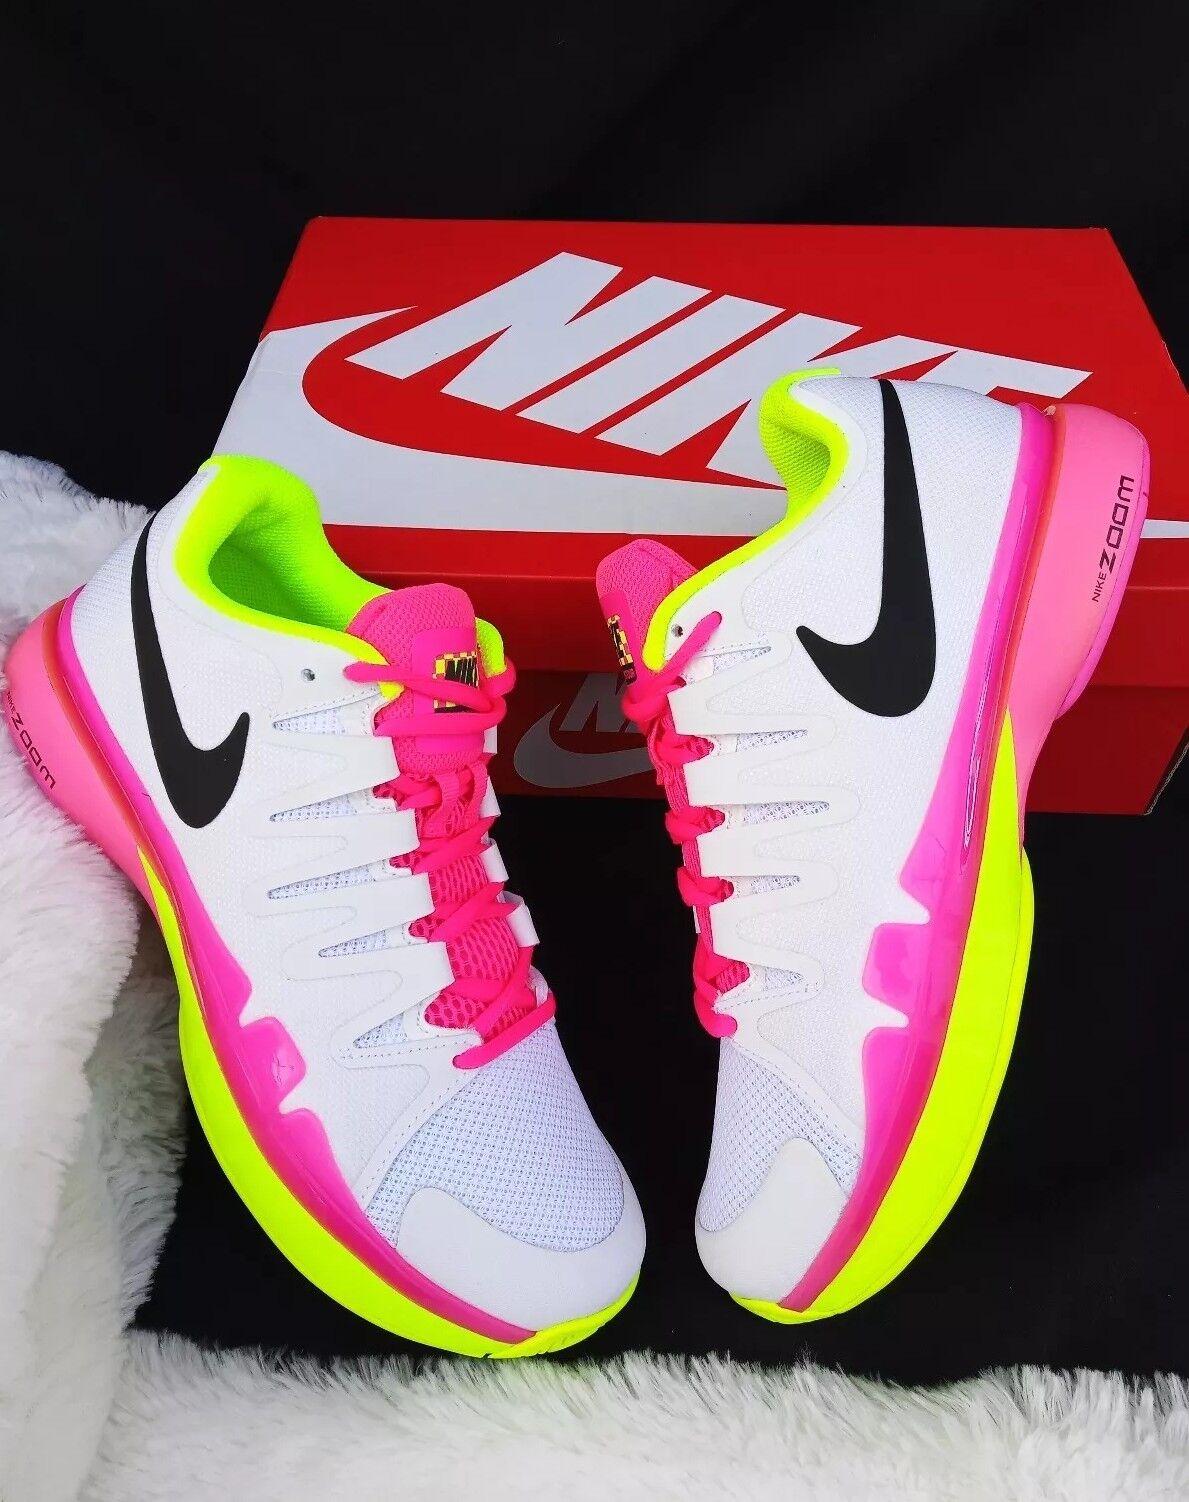 Size 11 women's  Nike Zoom Vapor 9.5 Tour White pink Green 631475 107 tennis